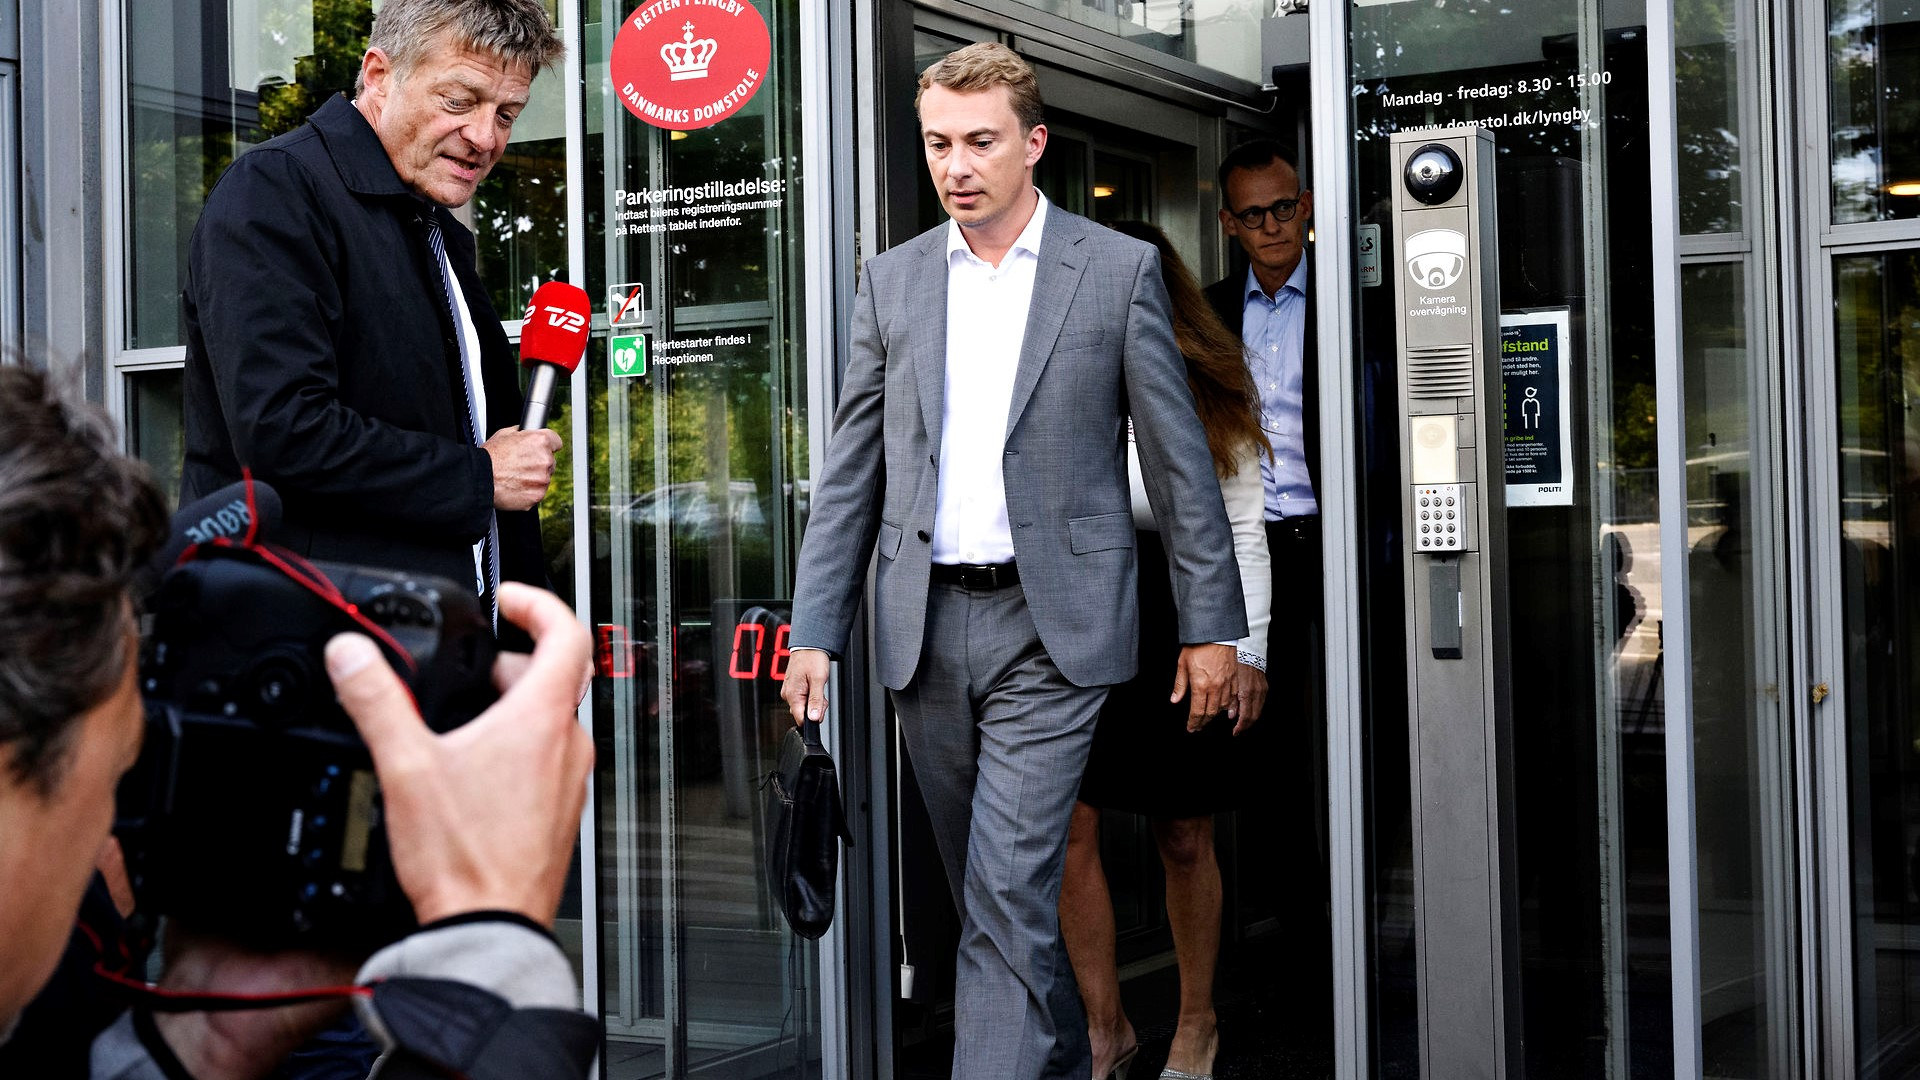 Jan Kristoffersen (Å): Forestiller Morten Messerschmidt sig, at danske dommere fremover skal screenes for partibog og likes på Facebook?